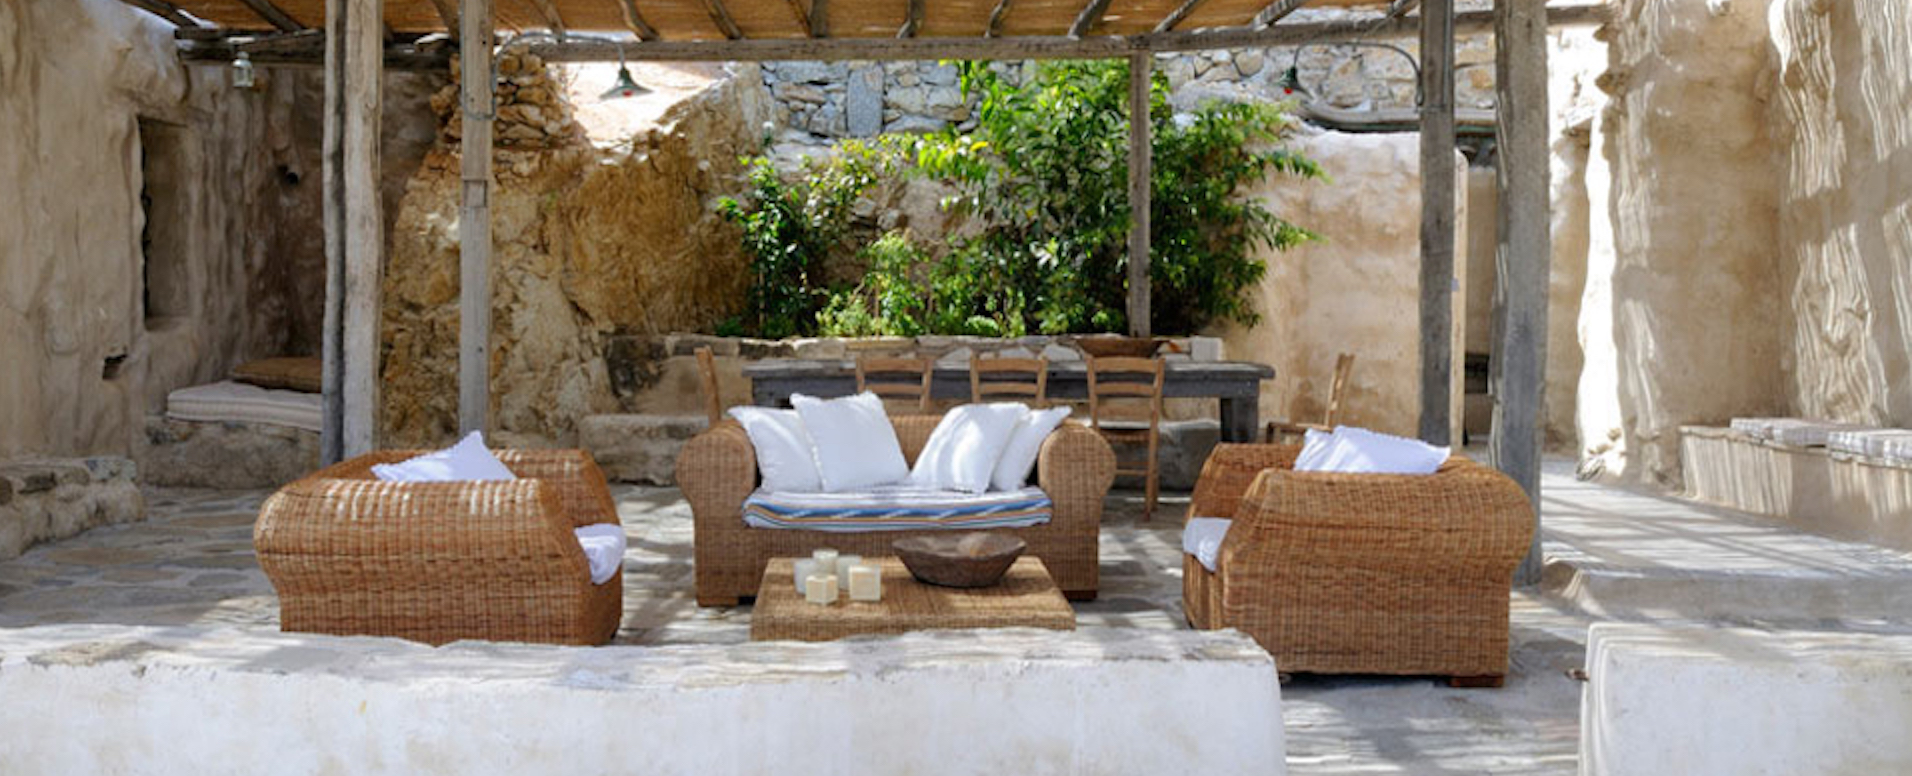 10. Louer une superbe villa avec Villanovo - Cyclades - Autres îles